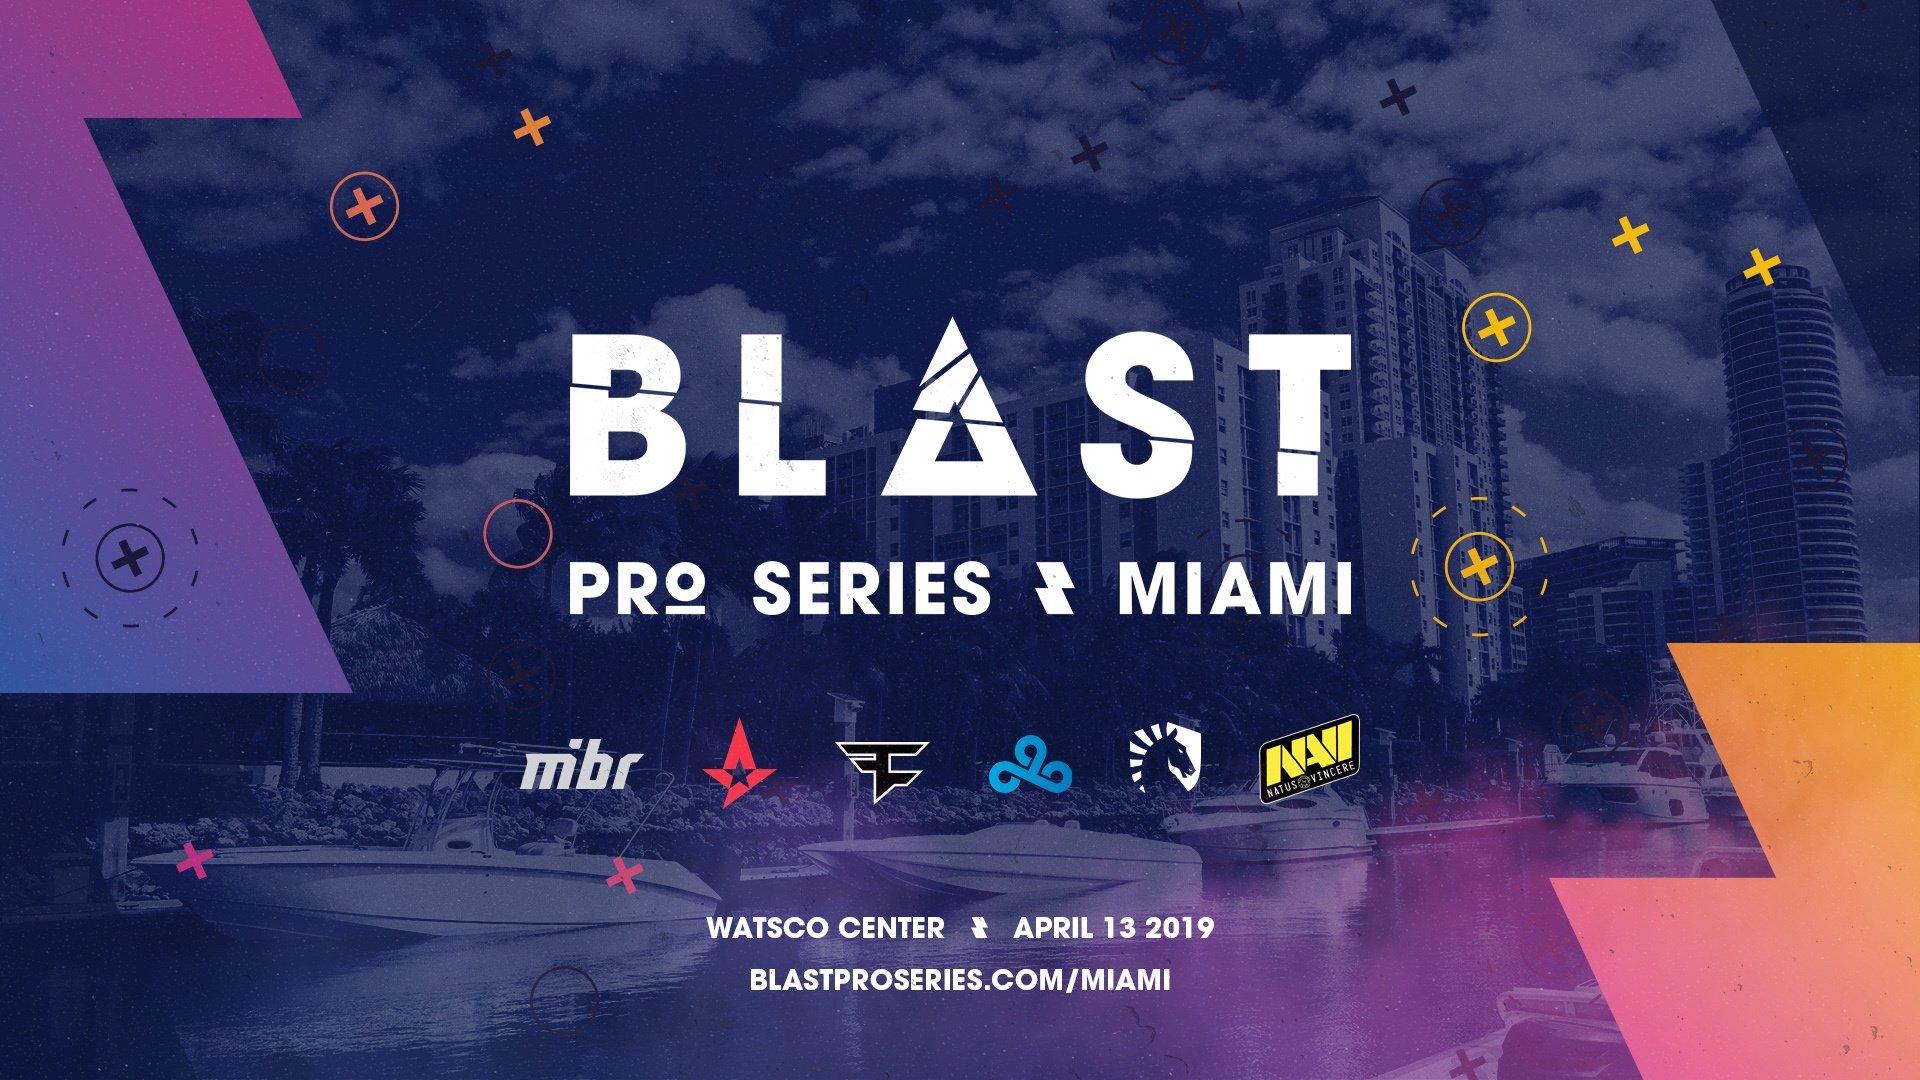 BLAST Pro Series Miami